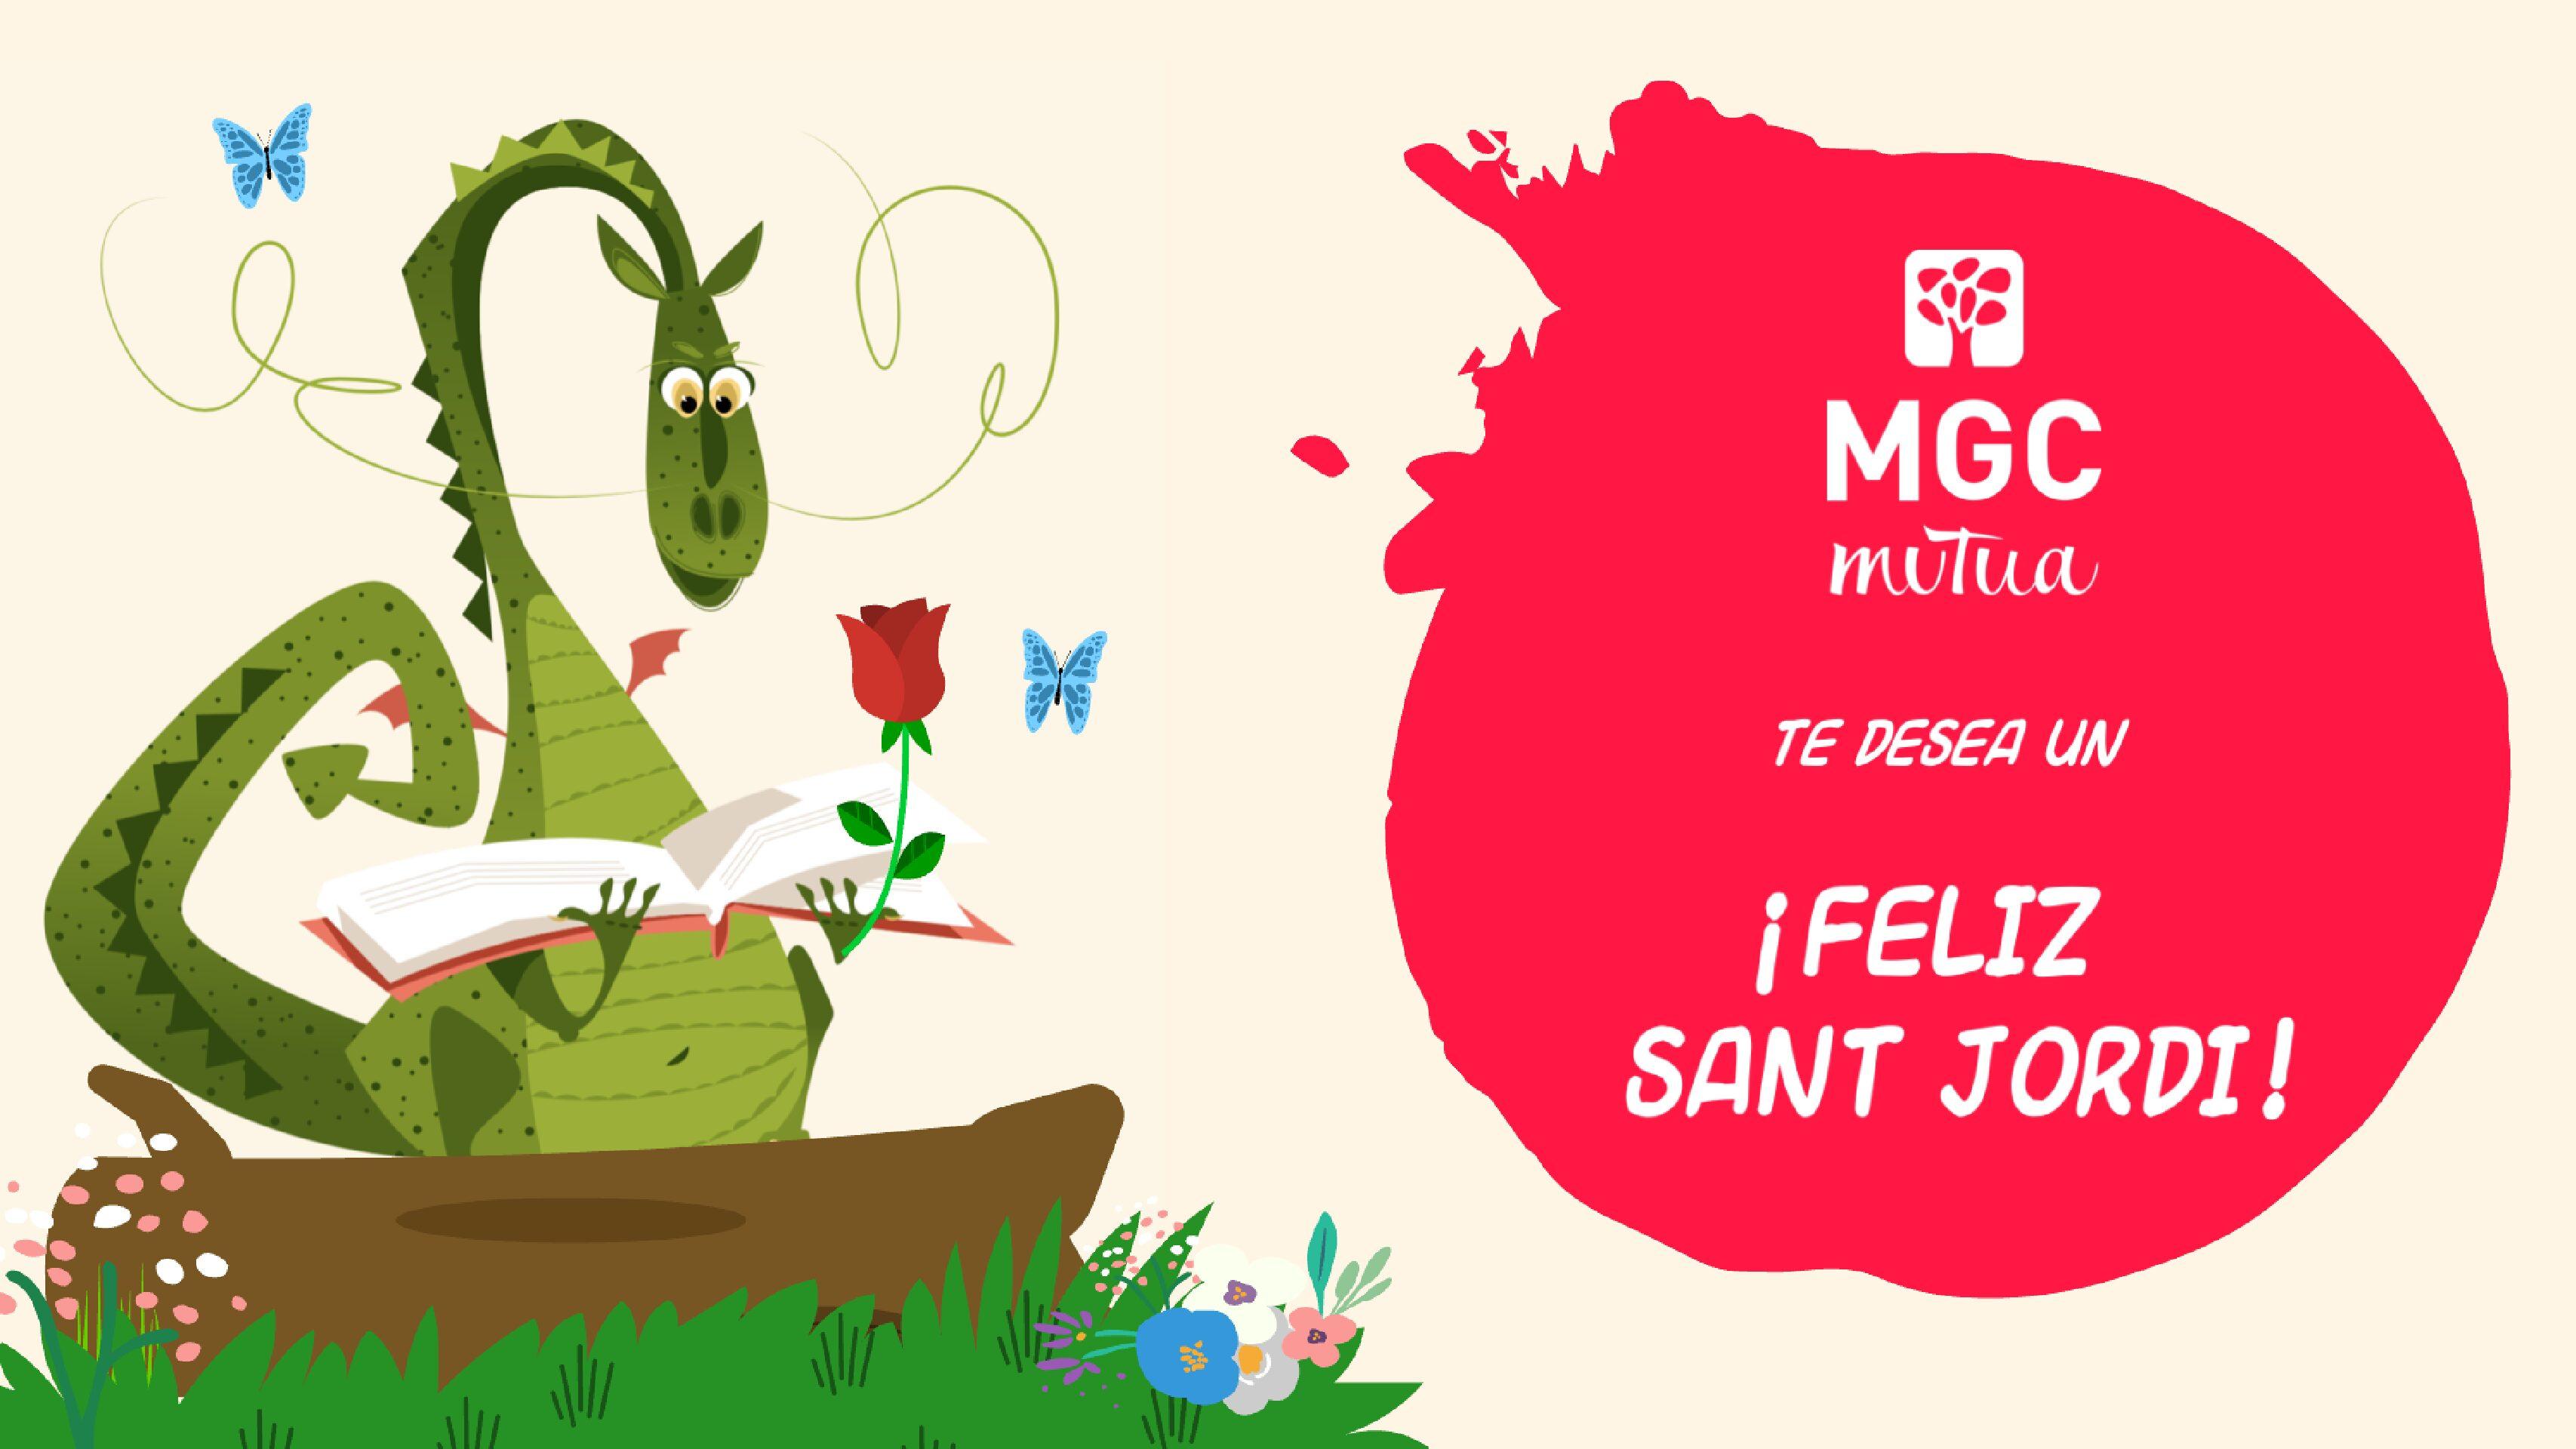 Obras ganadoras del «Concurso Sant Jordi MGC Mutua»